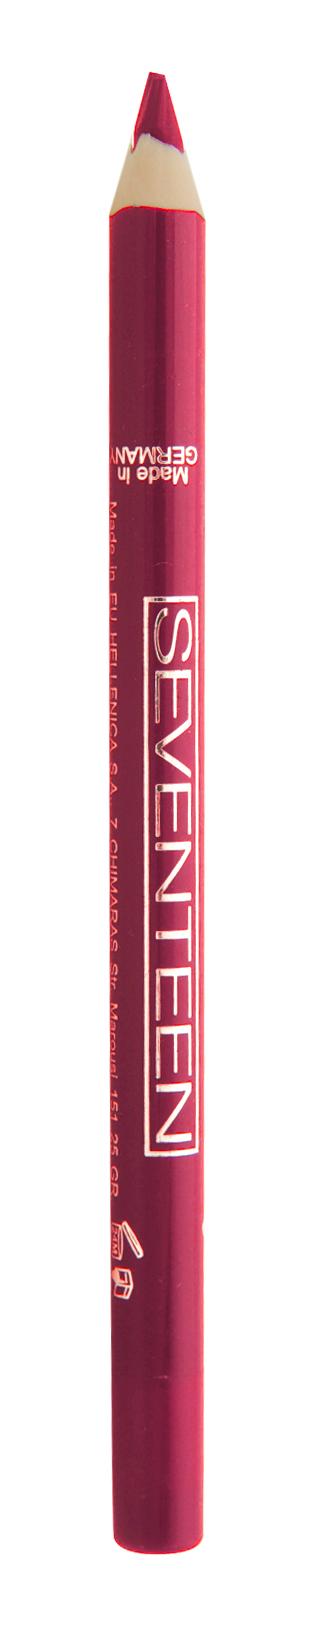 SEVENTEEN Карандаш водостойкий с витамином Е для губ, 09 фуксия / Super Smooth W/P Lip Liner 1,2 г